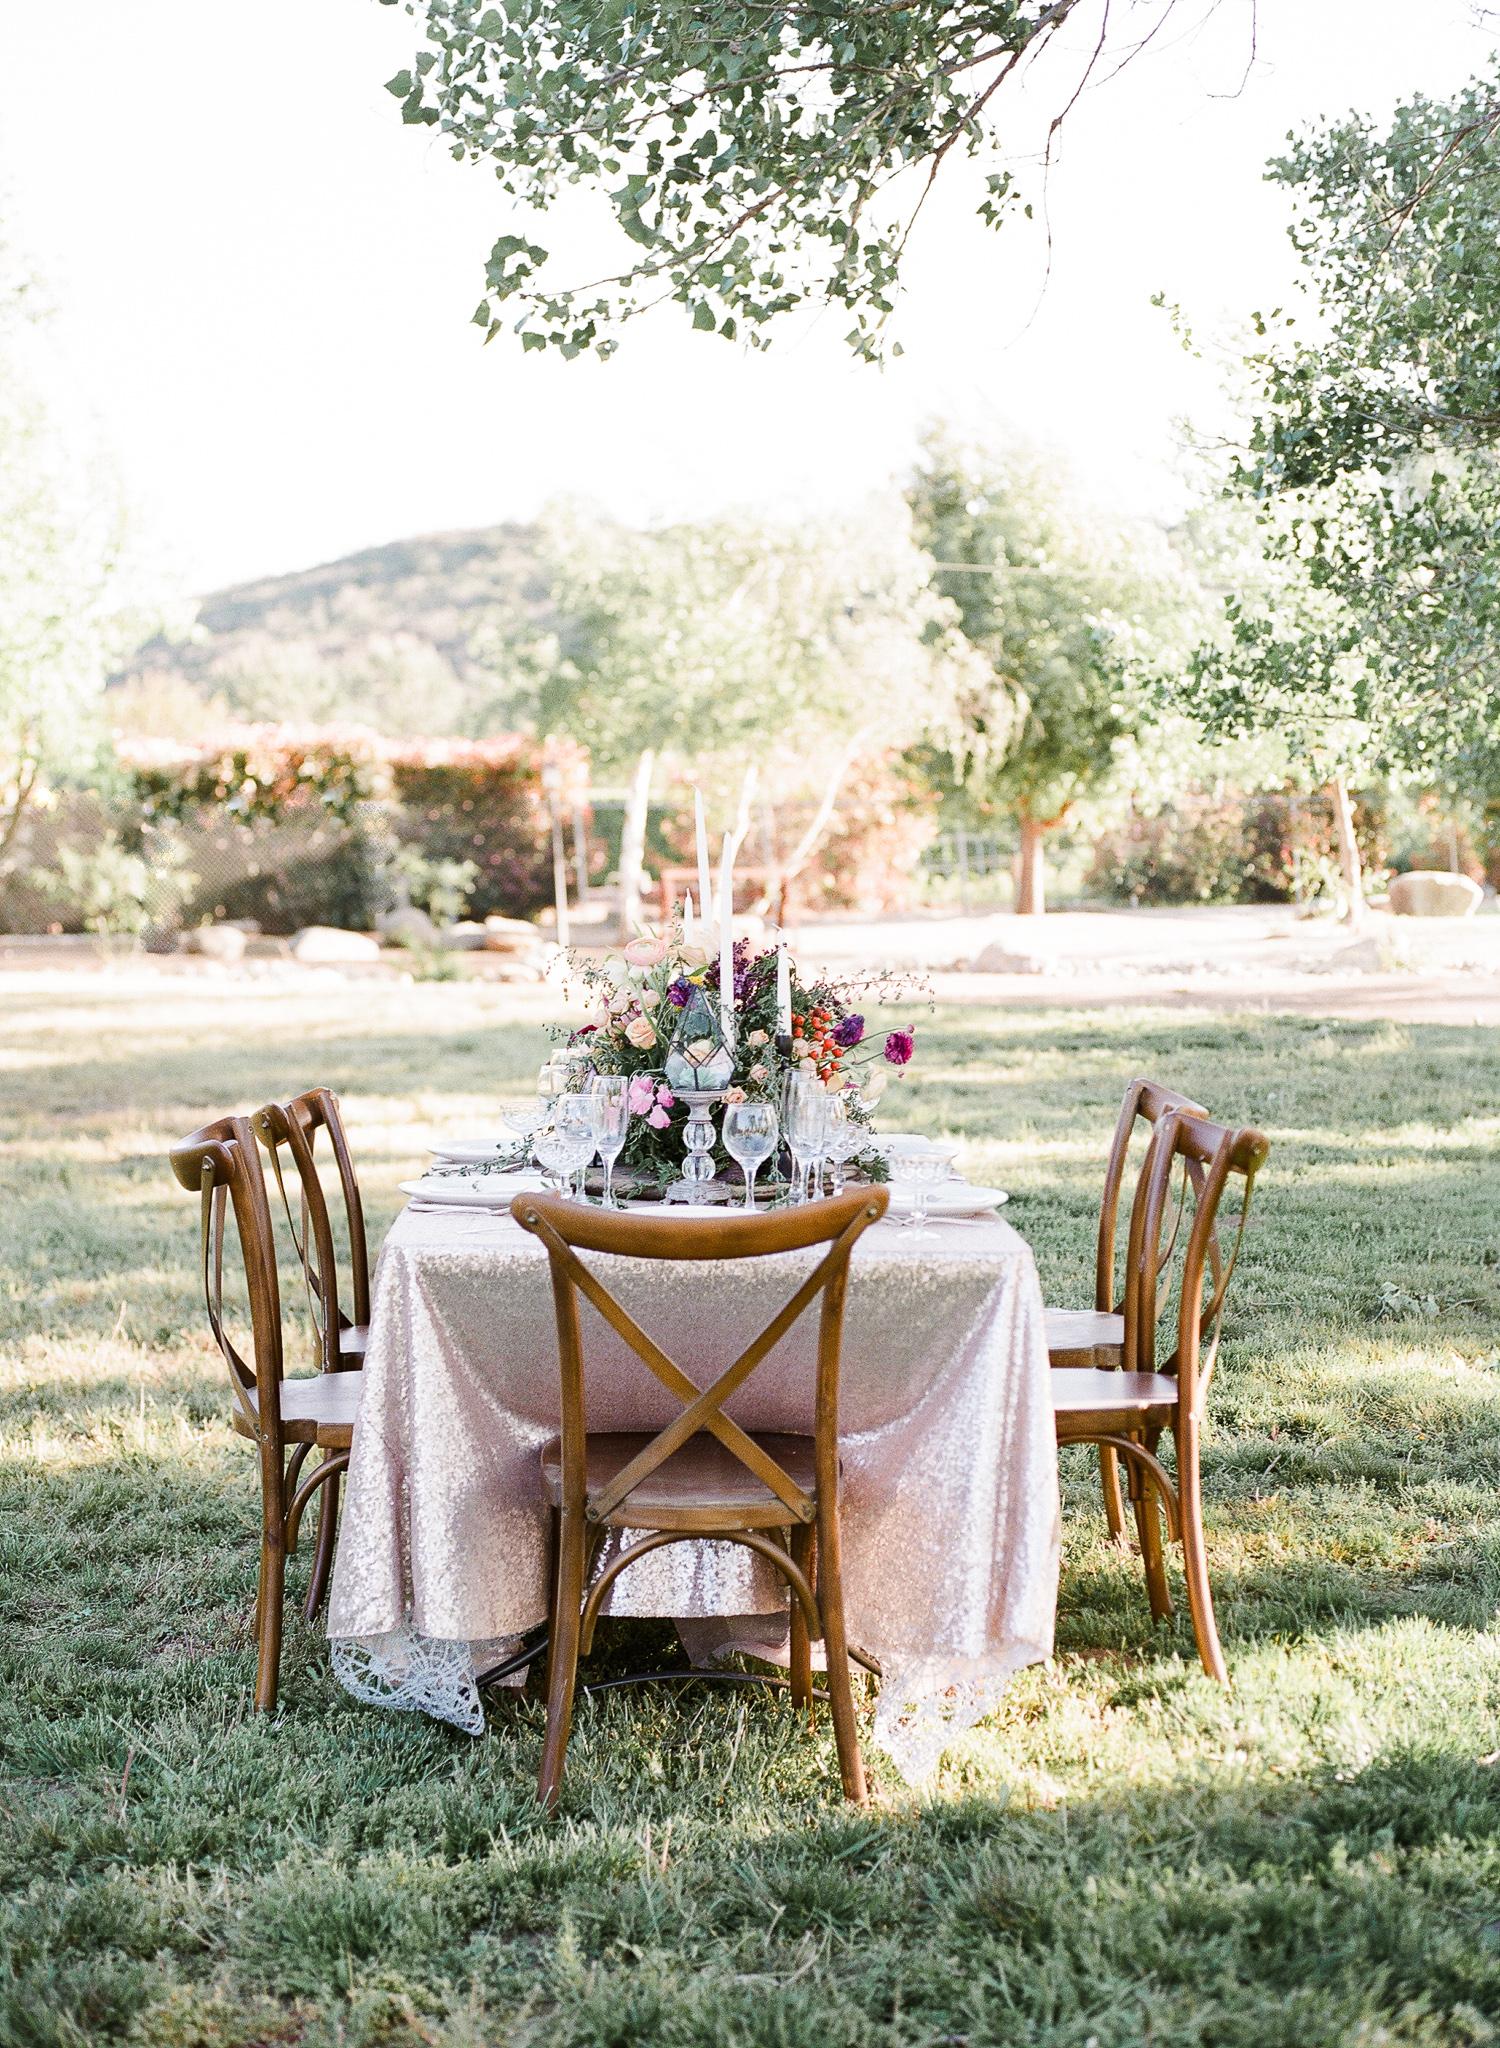 MeghanElise Photography - Shootout - Wedding Inspiration - 000090360009.jpg